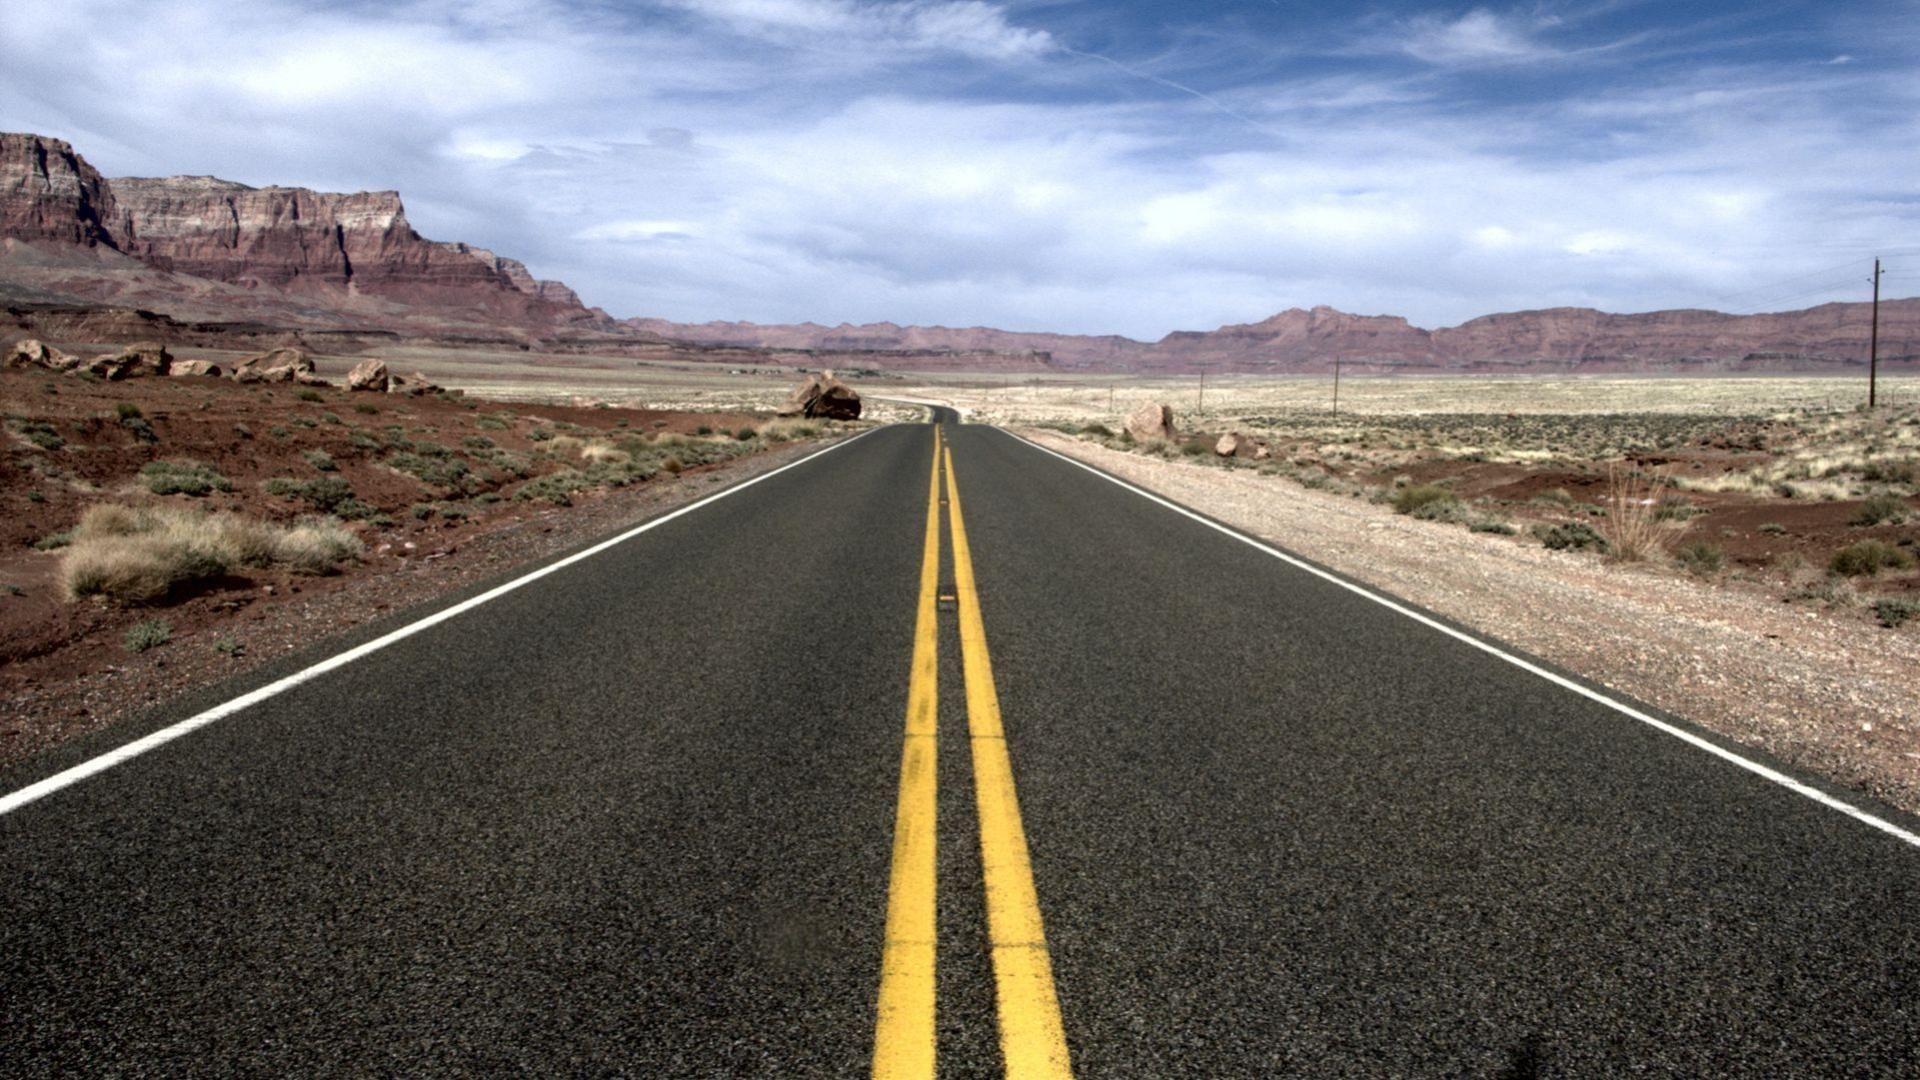 Road In Arizona High Quality Wallpaper Hd Desktop